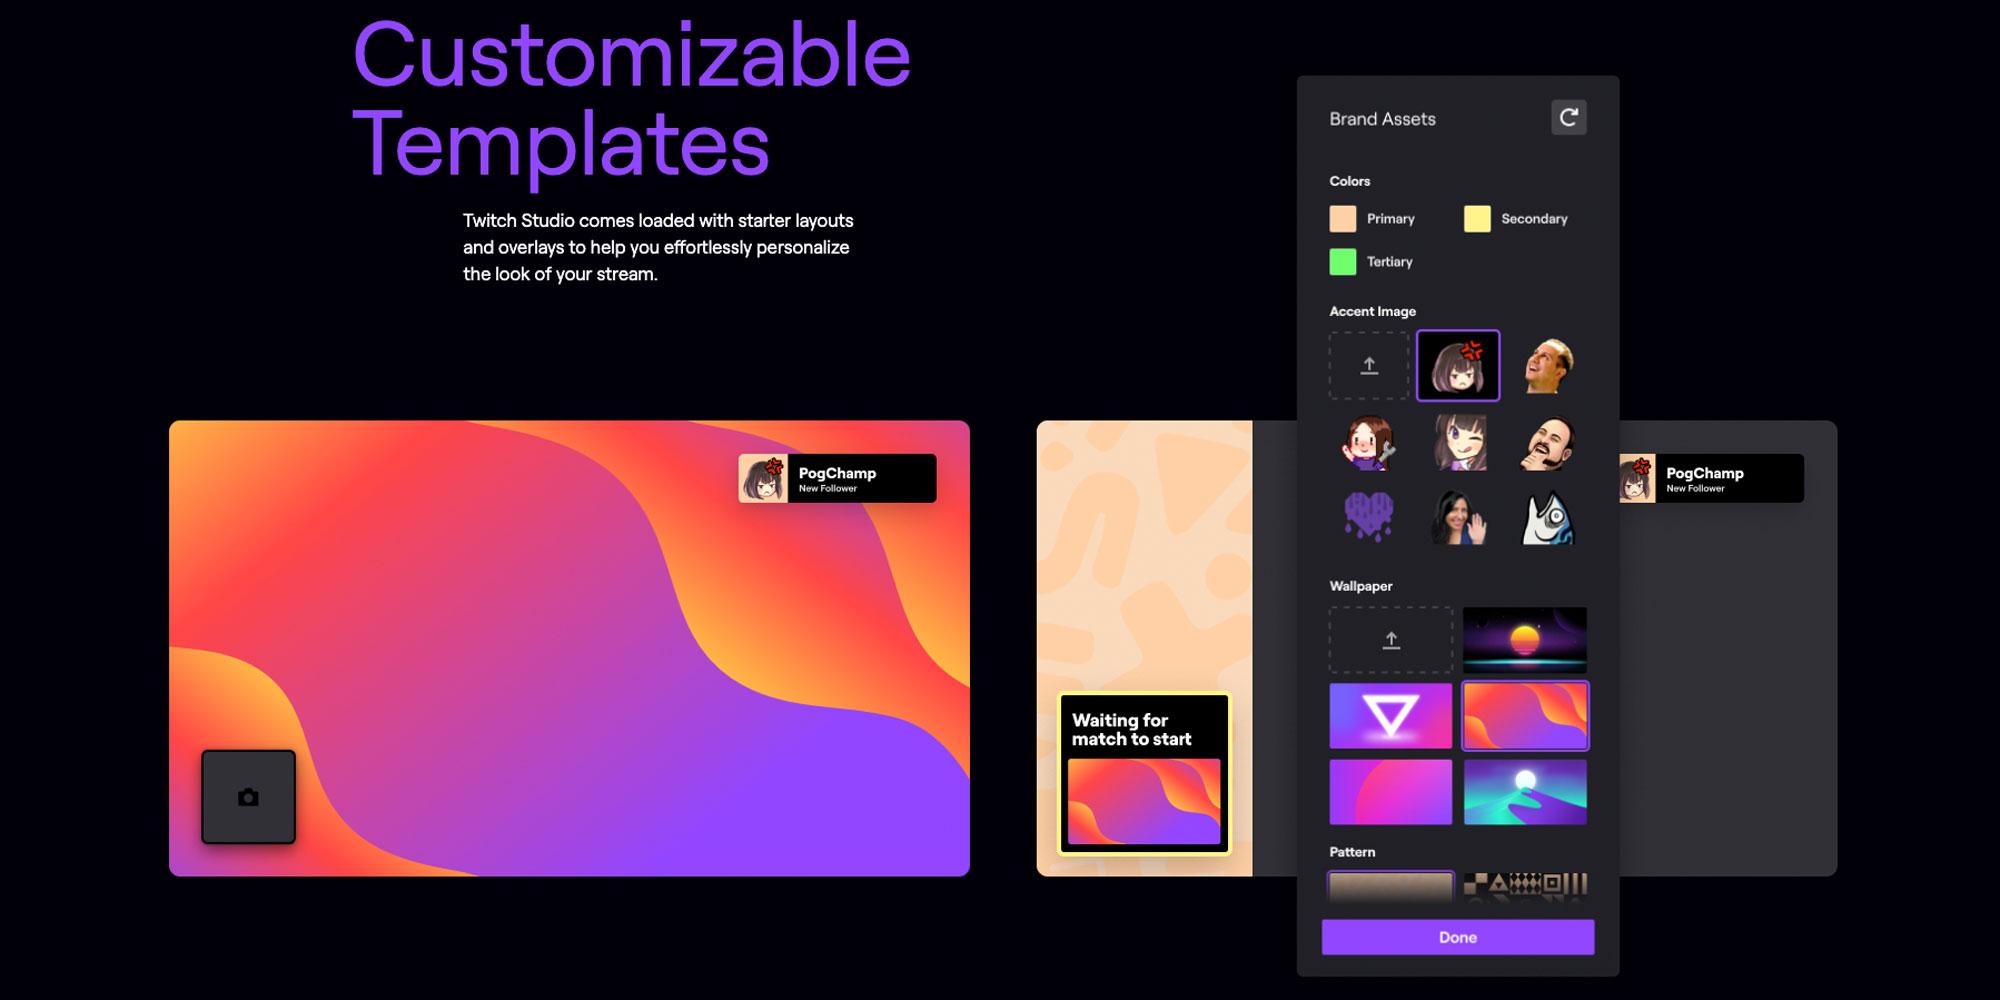 Twitch Studio Customizable Templates